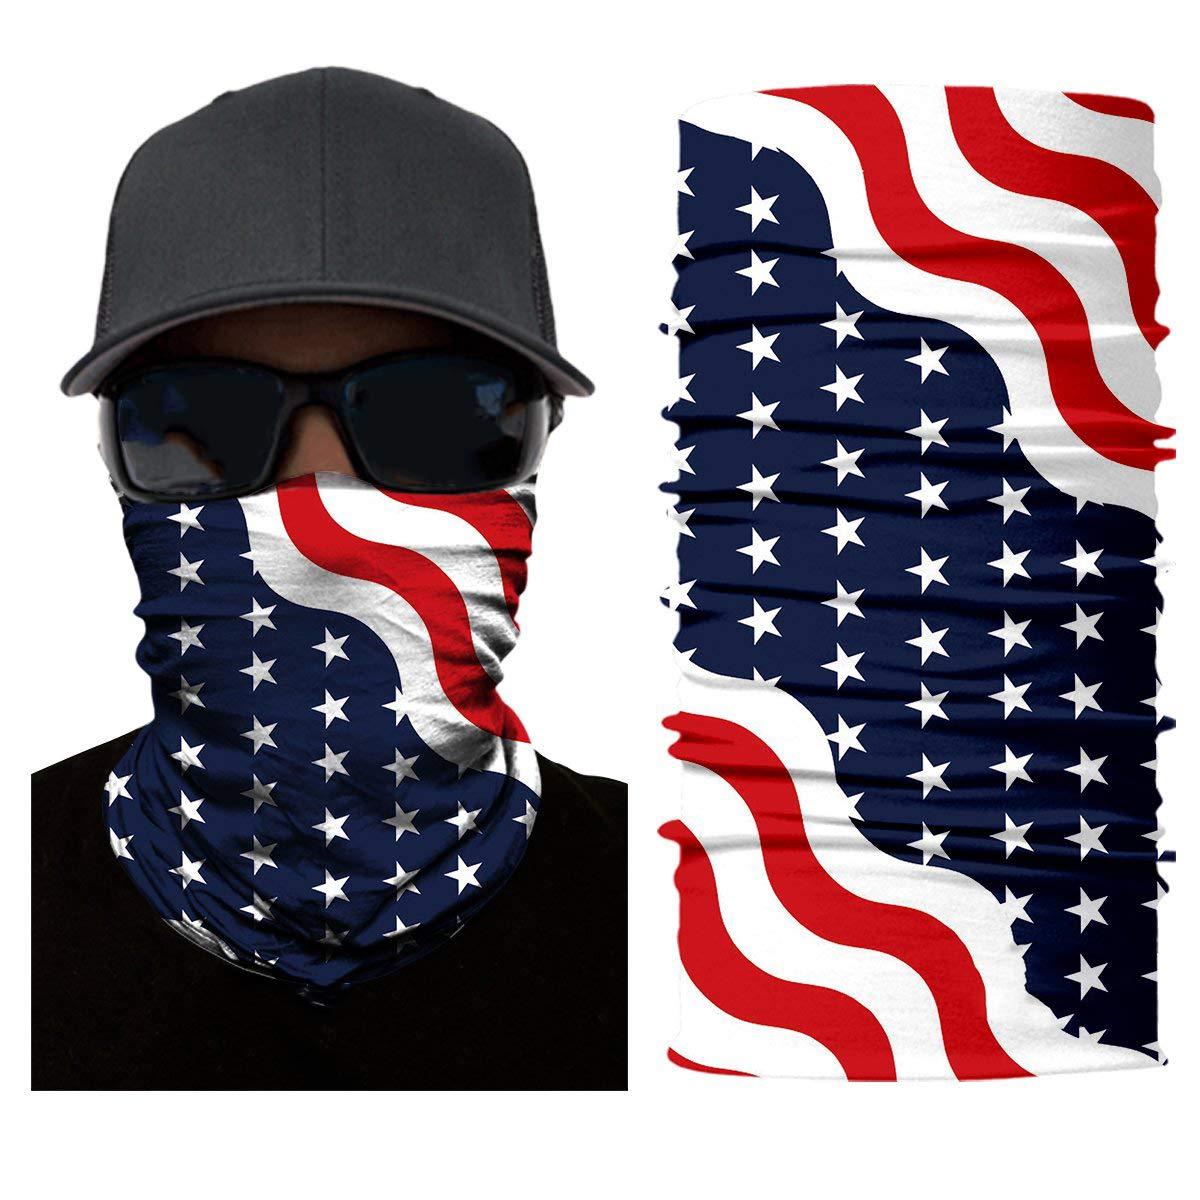 Fishing Fast Drying /& Lightweight for Running PTYHR Neck Gaiter//Headband//Multipurpose Face Mask//Bandana Head Wrap Unique Headbands Hiking